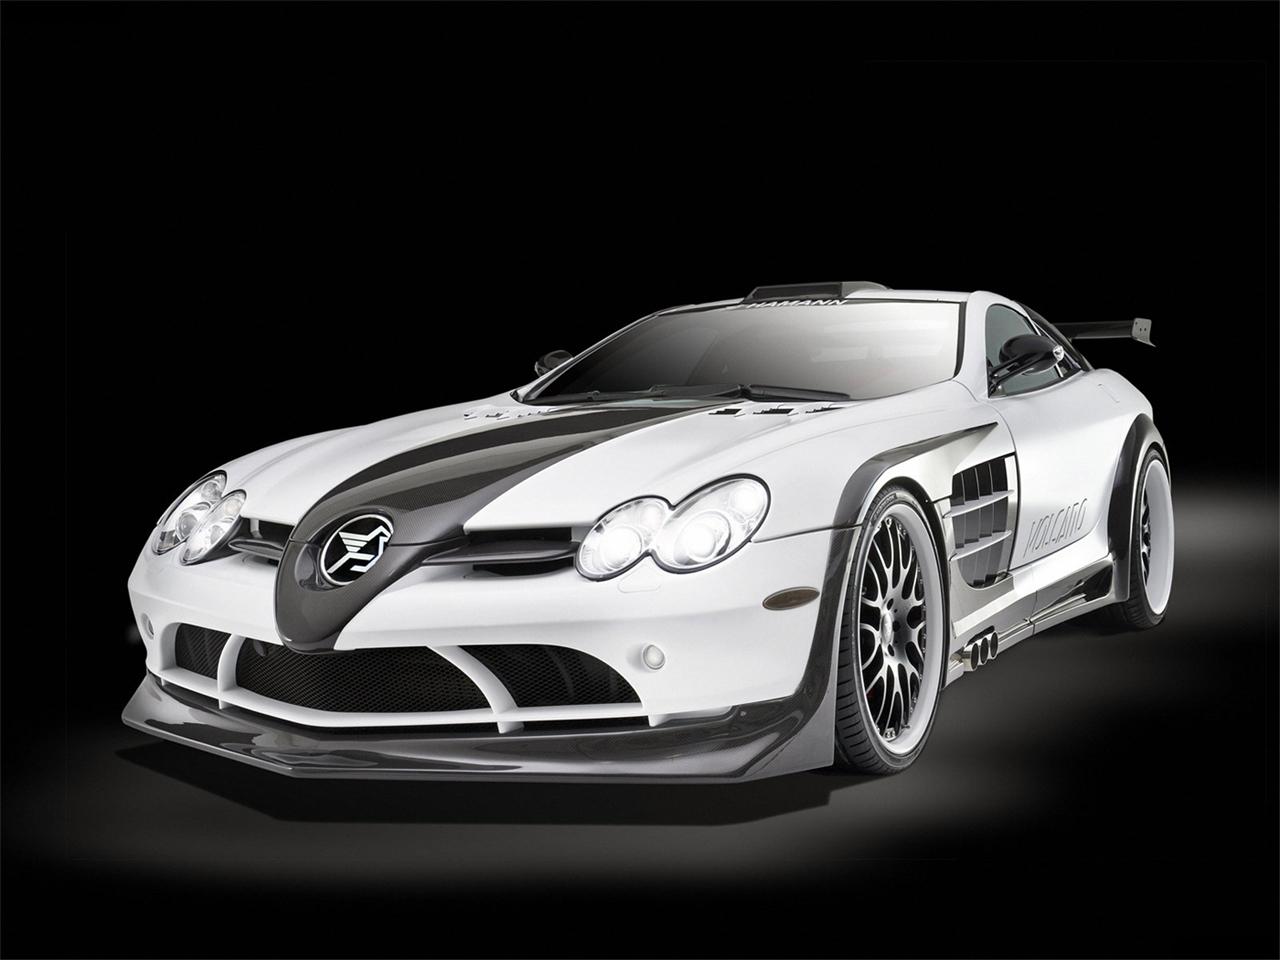 Mercedes Benz Car Wallpapers Desktop Free Download Cars Wallpapers